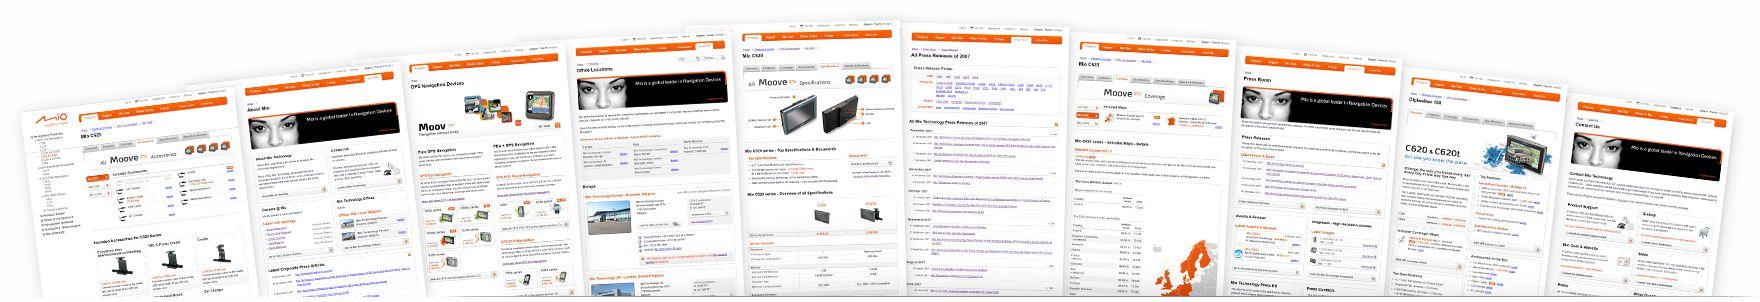 Mio Technology Website overview